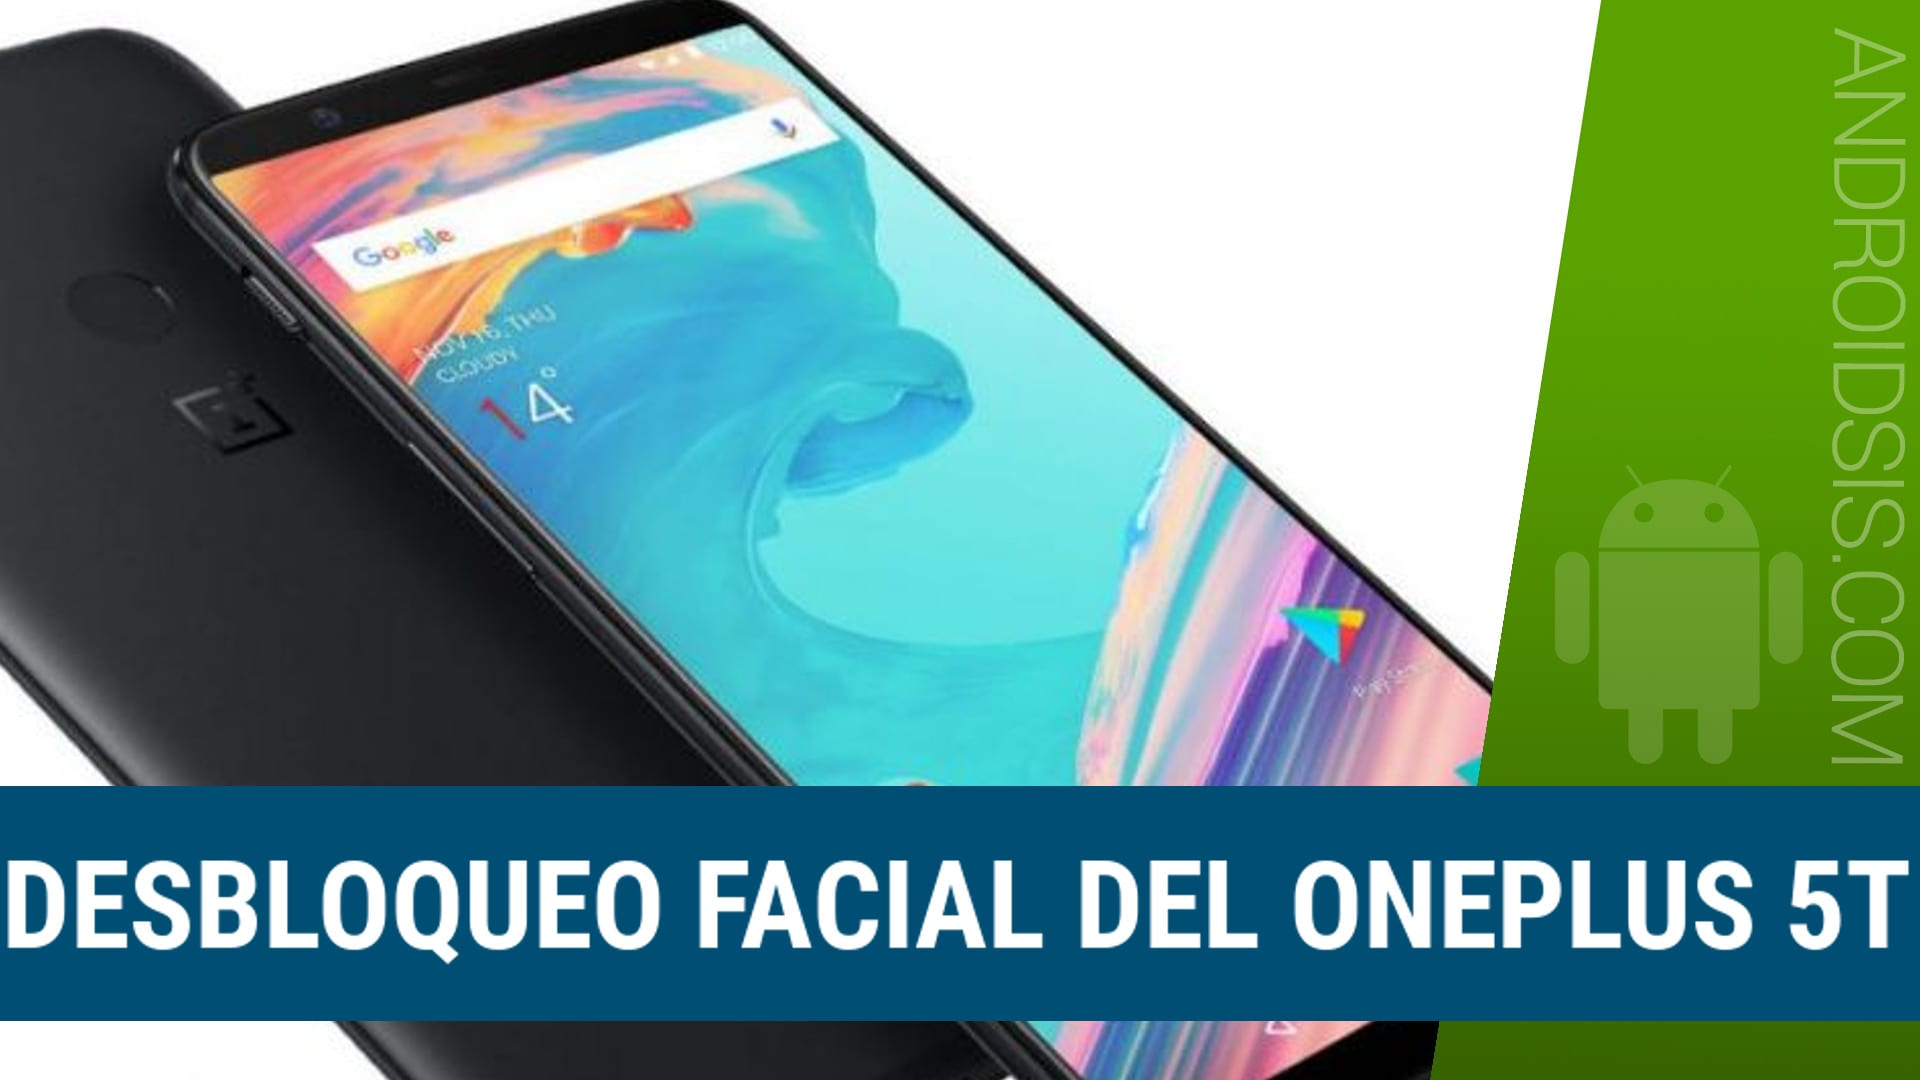 Desbloqueo facial de Oneplus 5T para otros Android